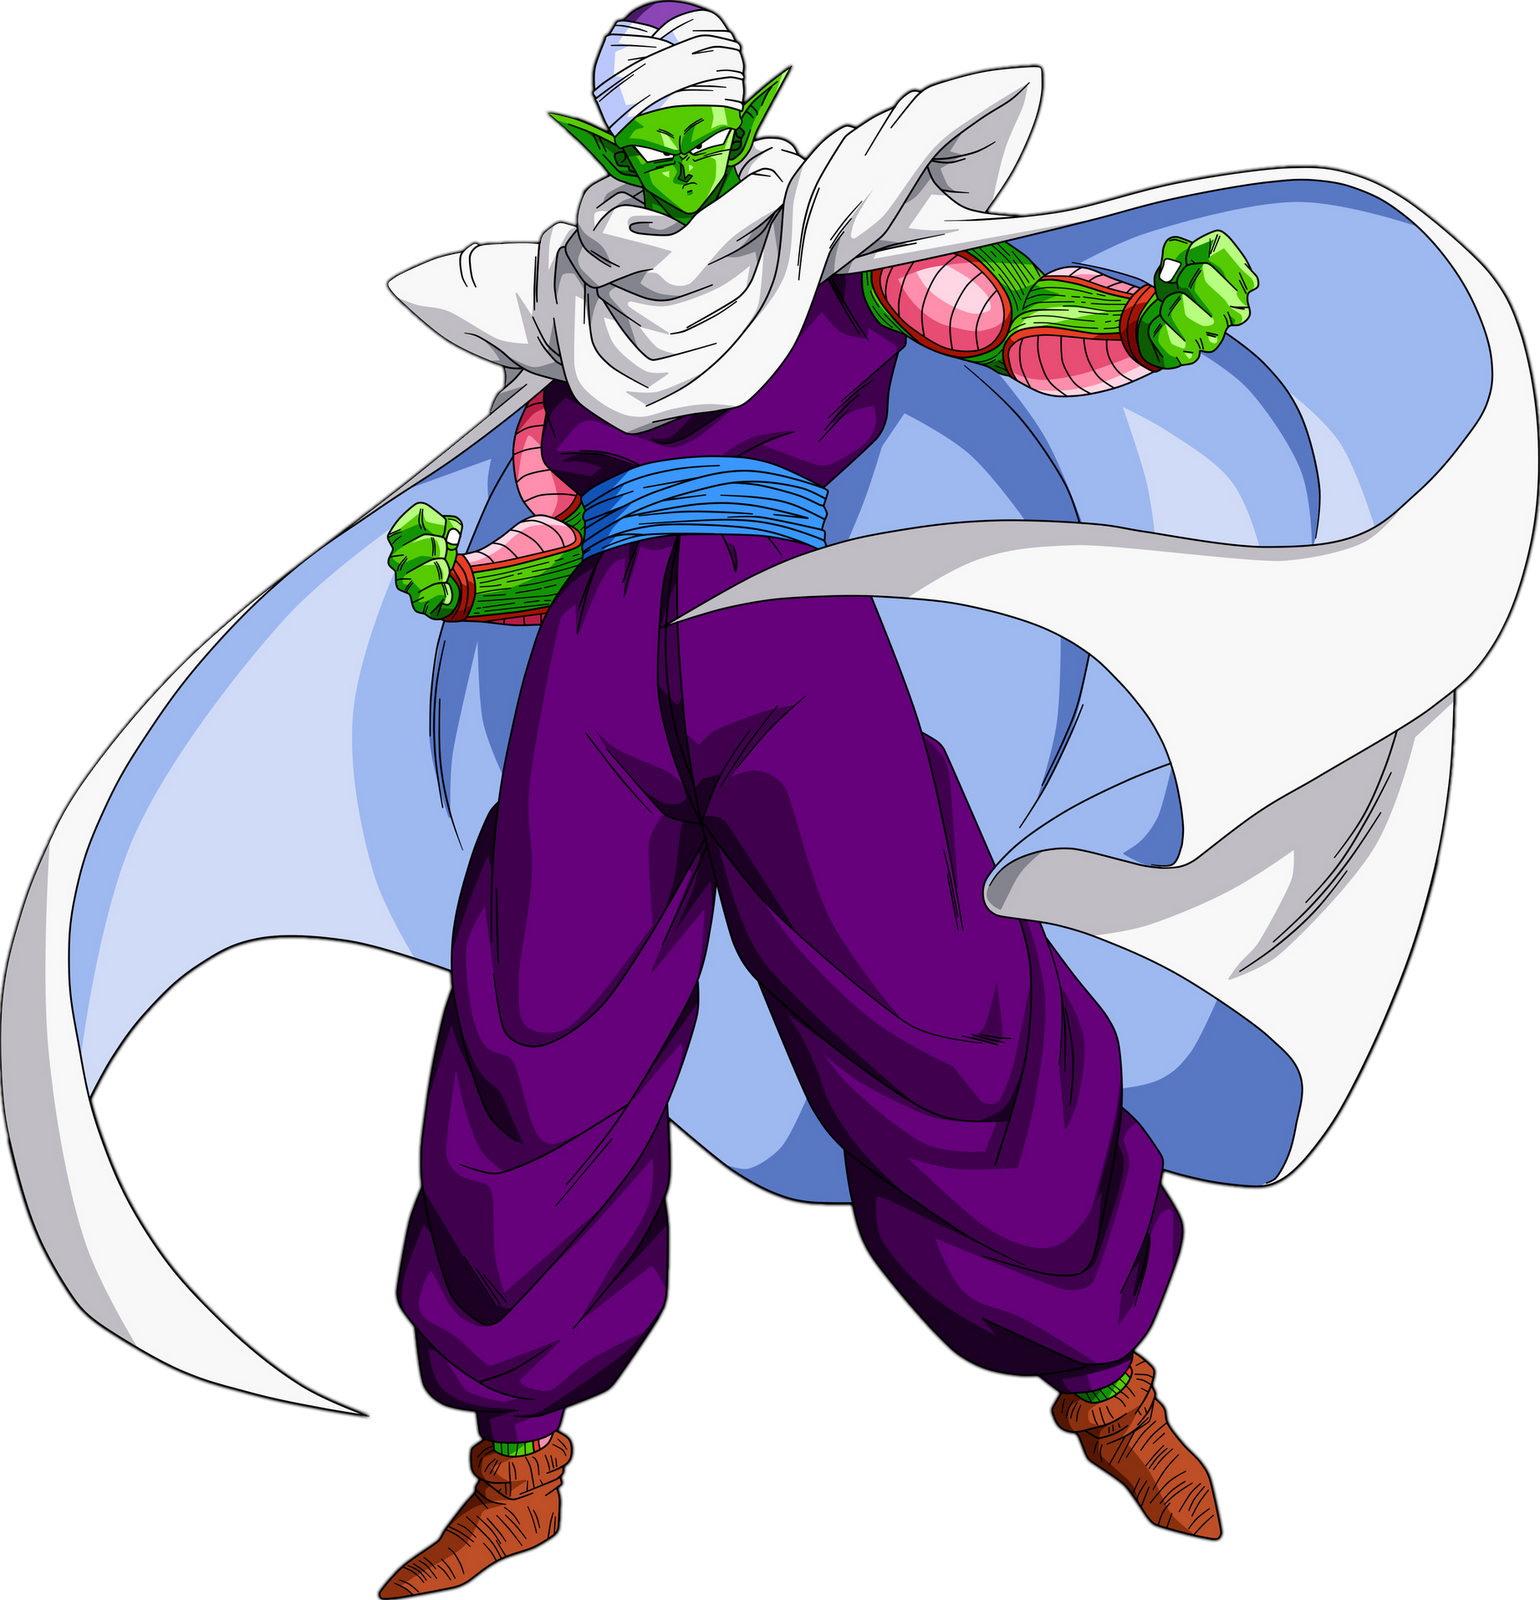 Resultado De Imagem Para Piccolo Dragon Ball Super Dragon Ball Z Dragon Ball Dragoes